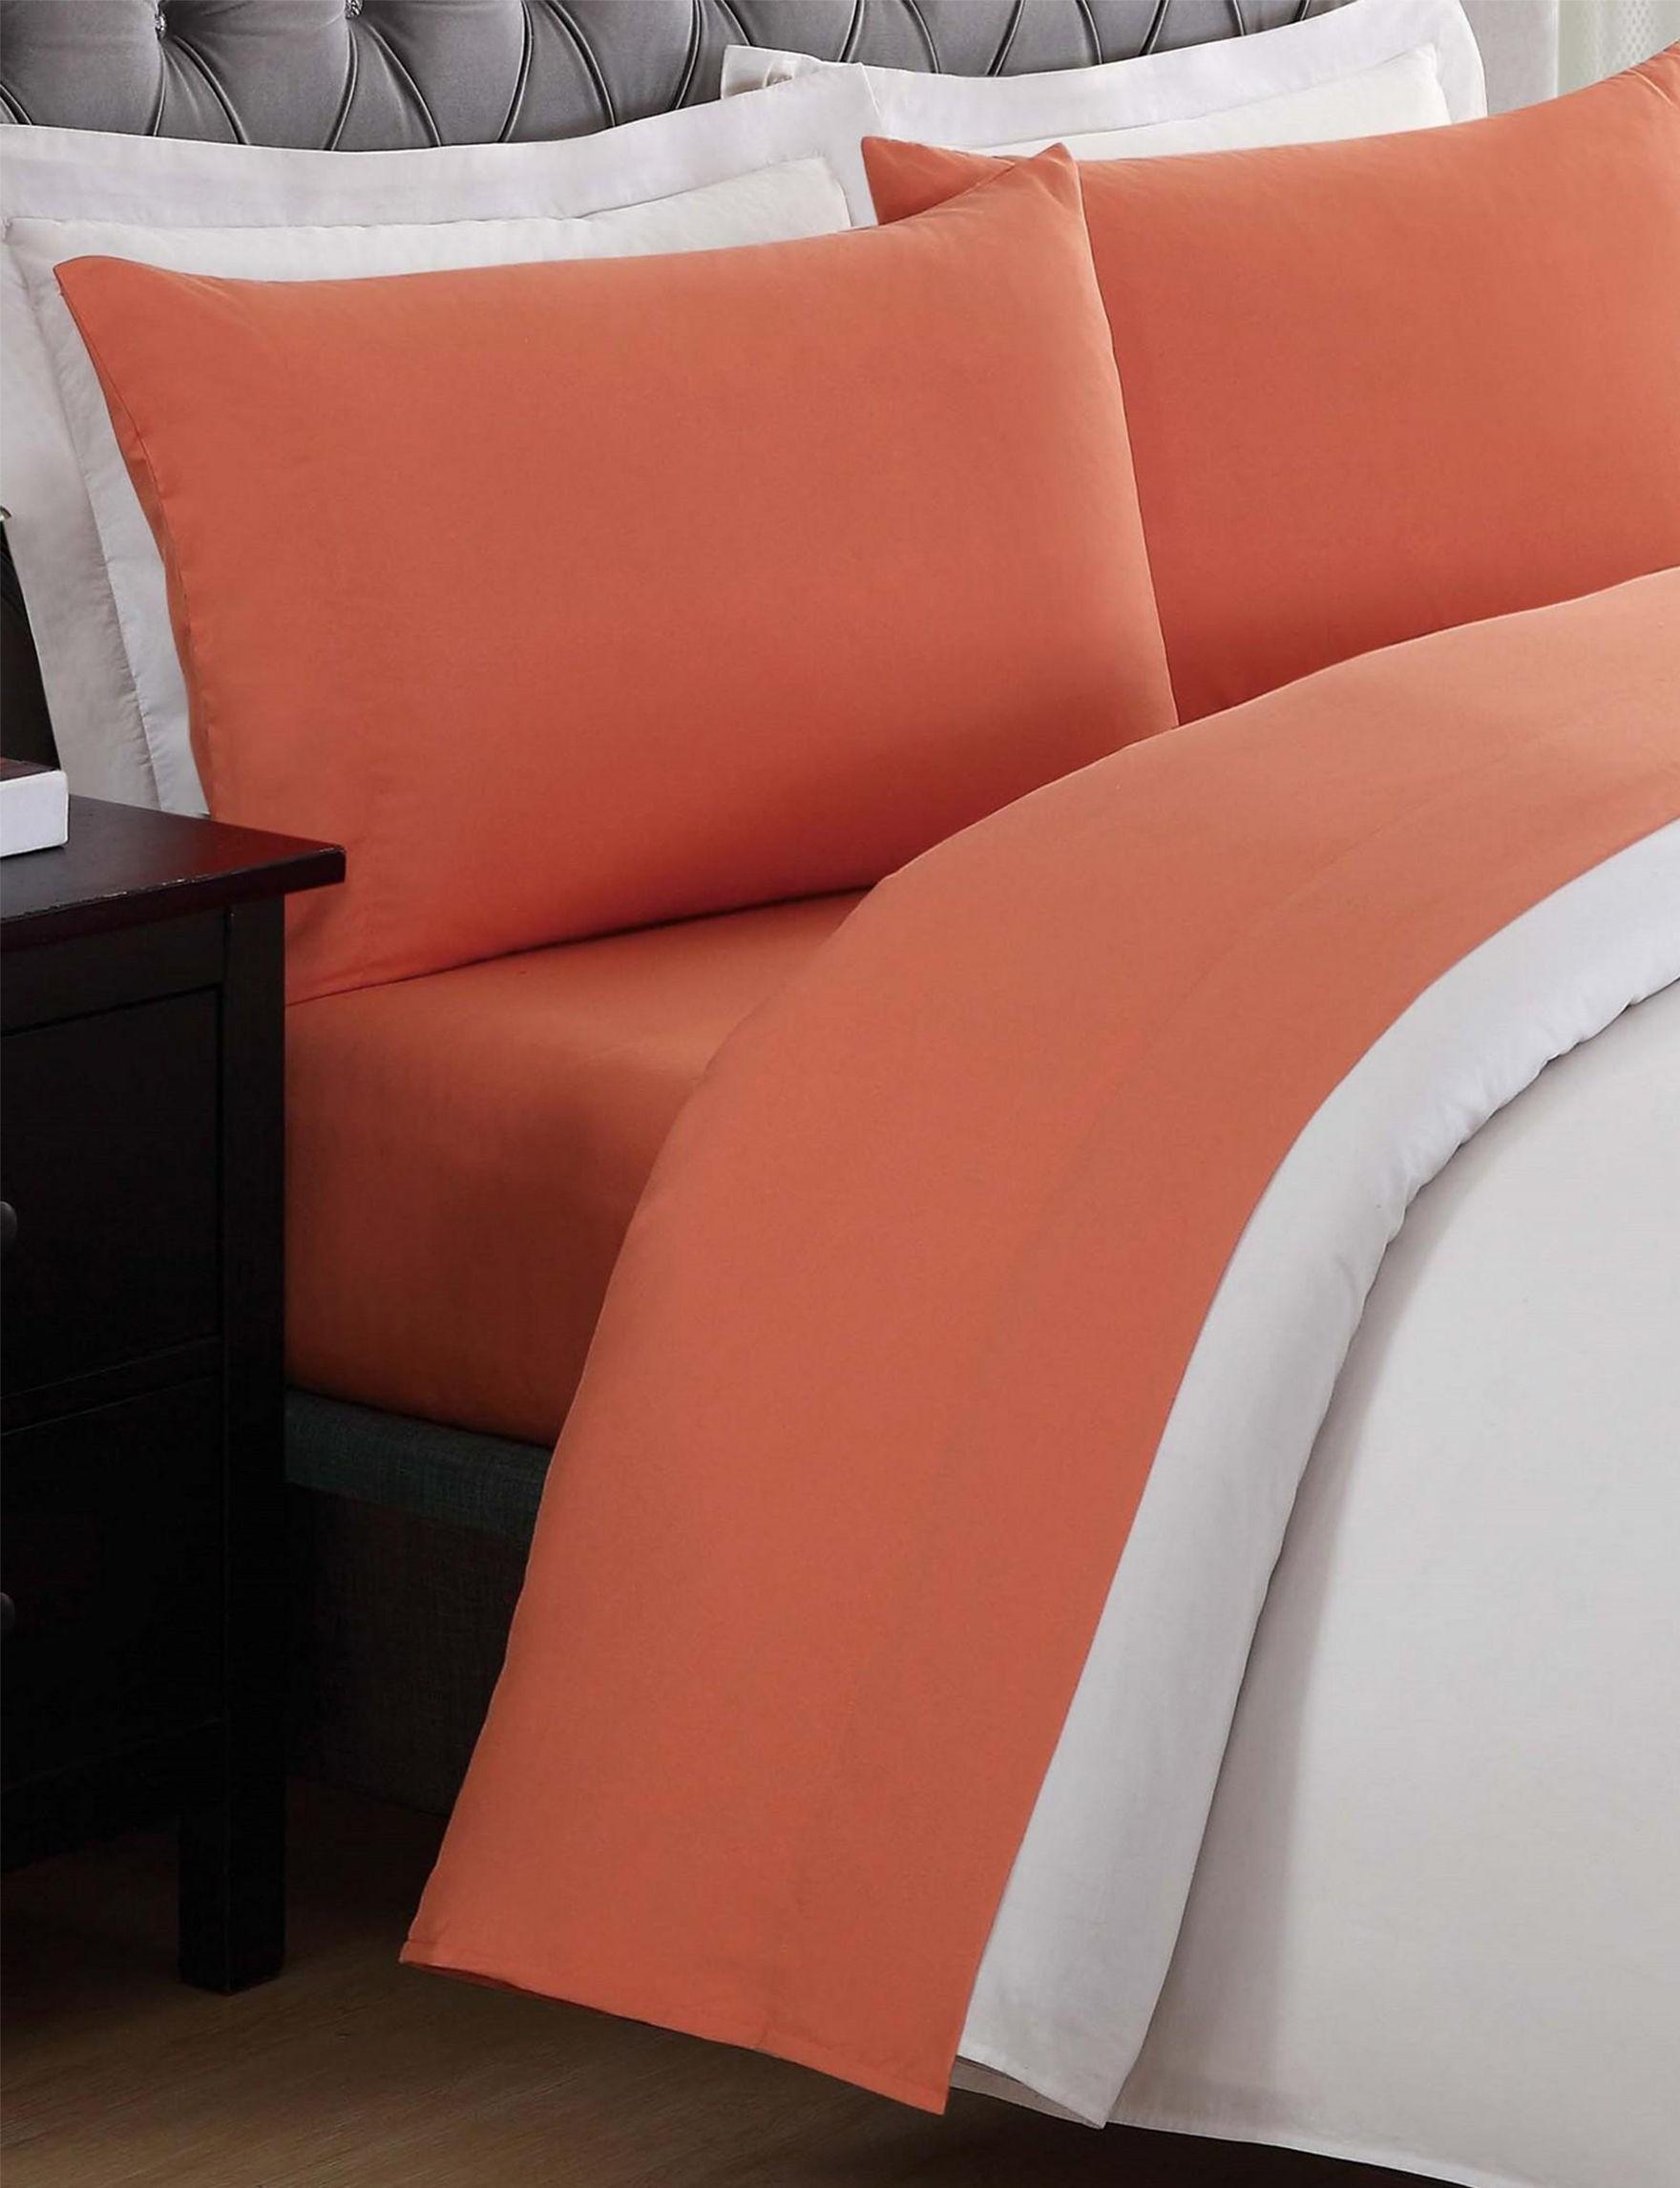 Laura Hart Kids Orange Sheets & Pillowcases